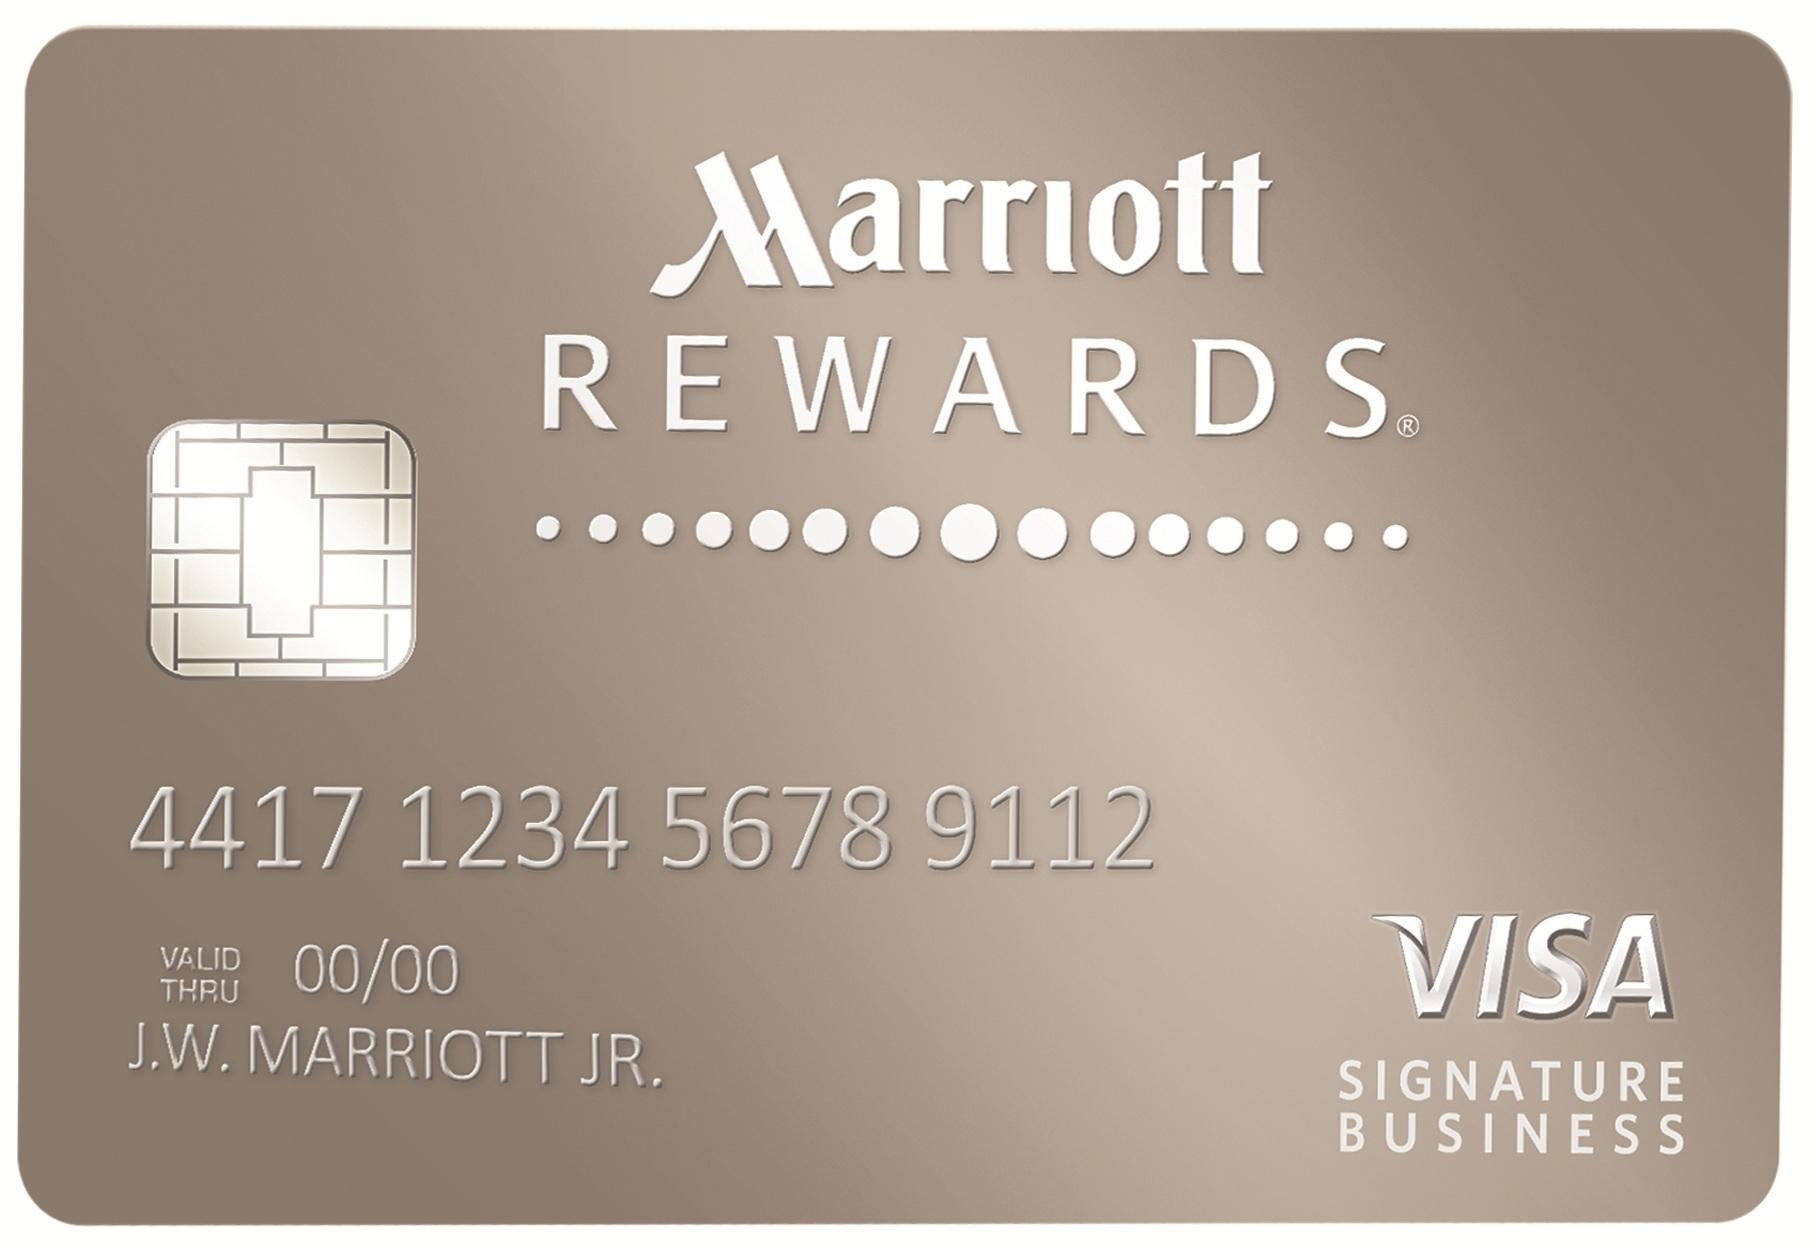 chase launches marriott rewards premier visa signature business